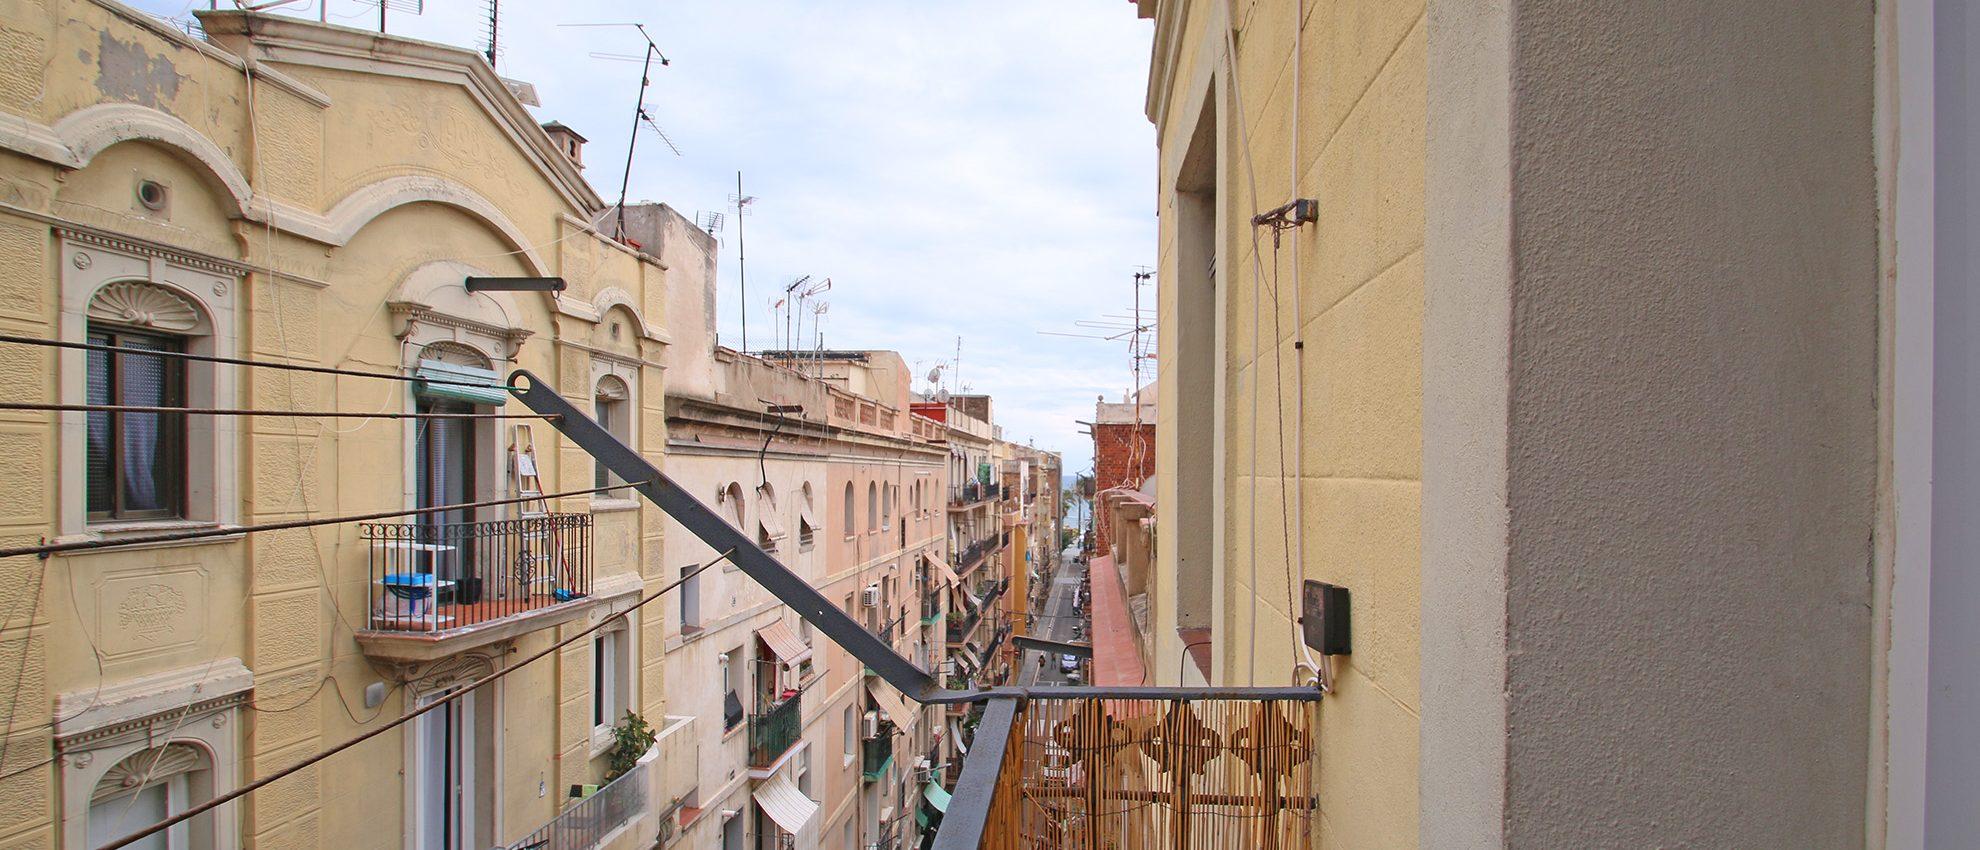 Comte de Santa Clara 9 apartment